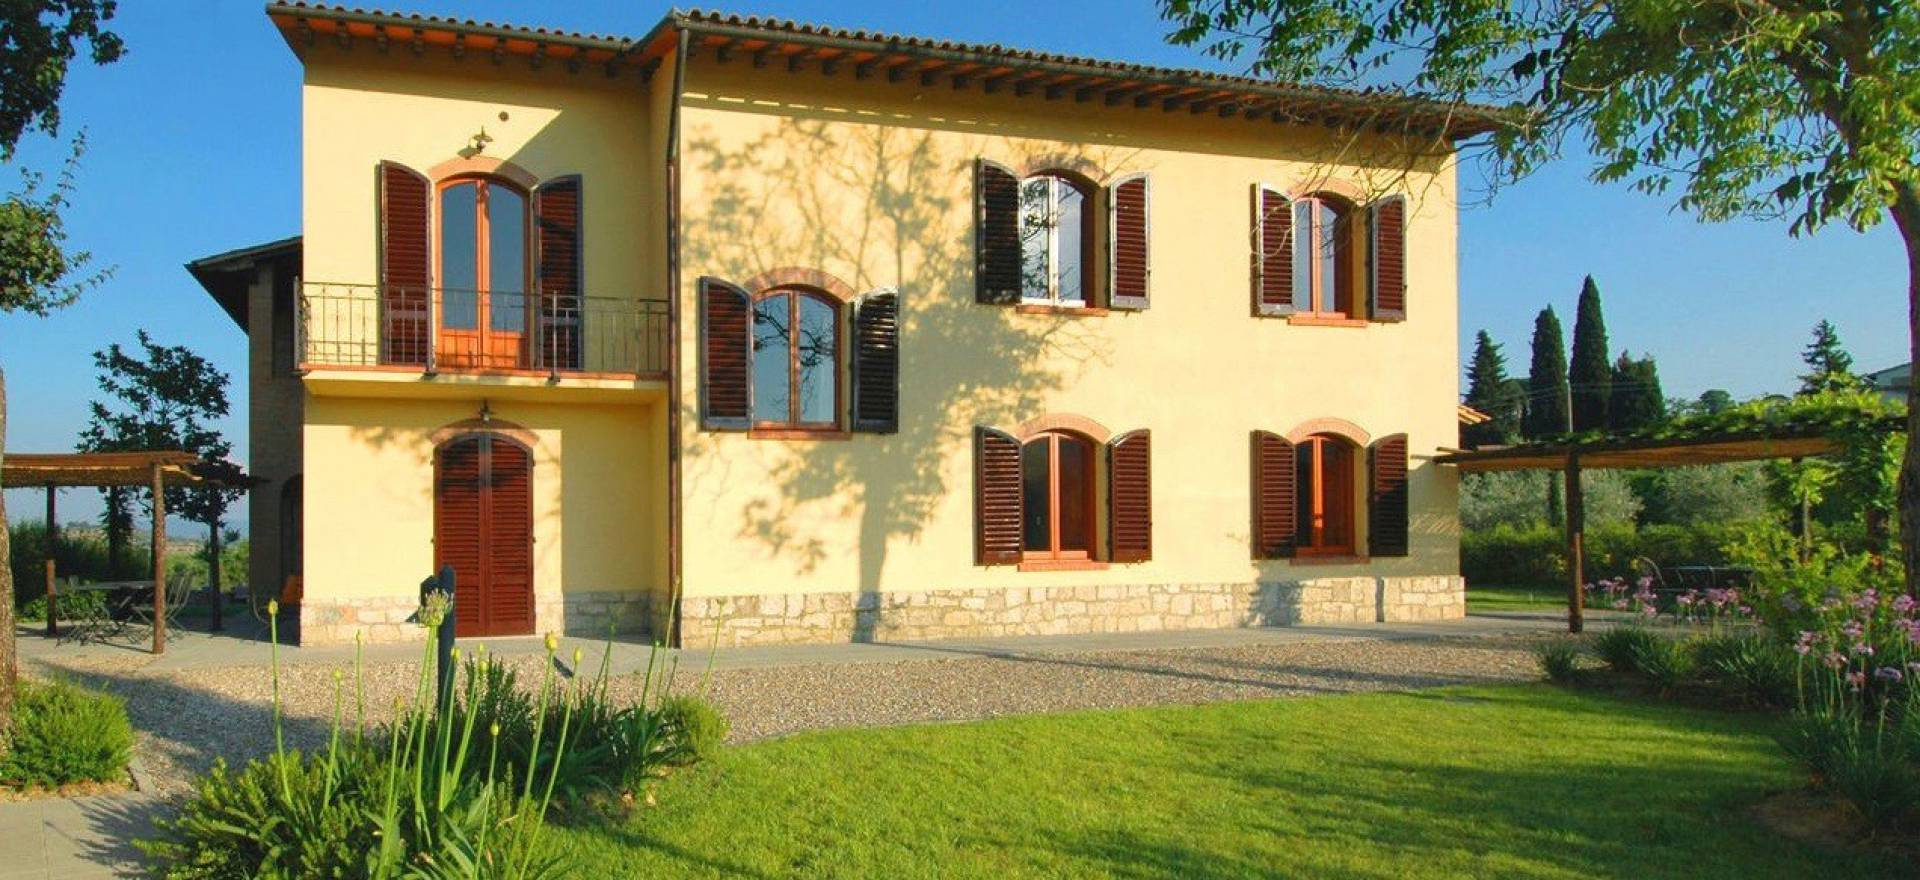 Agriturismo Toscana Agriturismo in Toscana con vista unica su San Gimignano